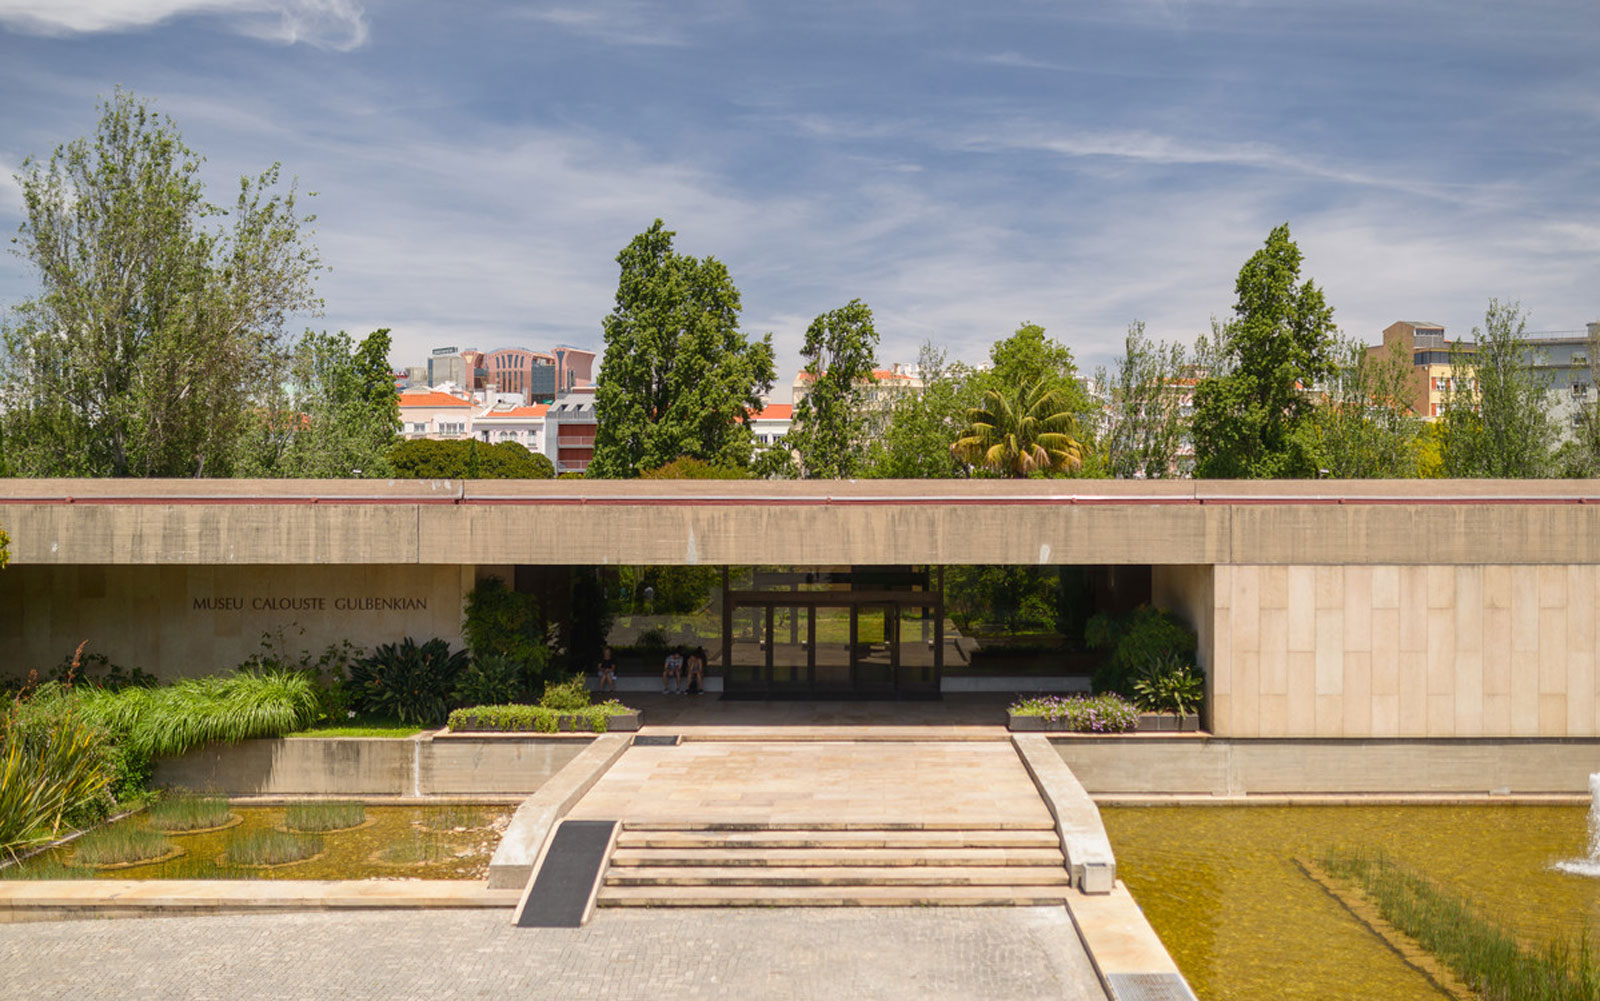 Museu Calouste Gulbenkian © Ricardo Oliveira Alves